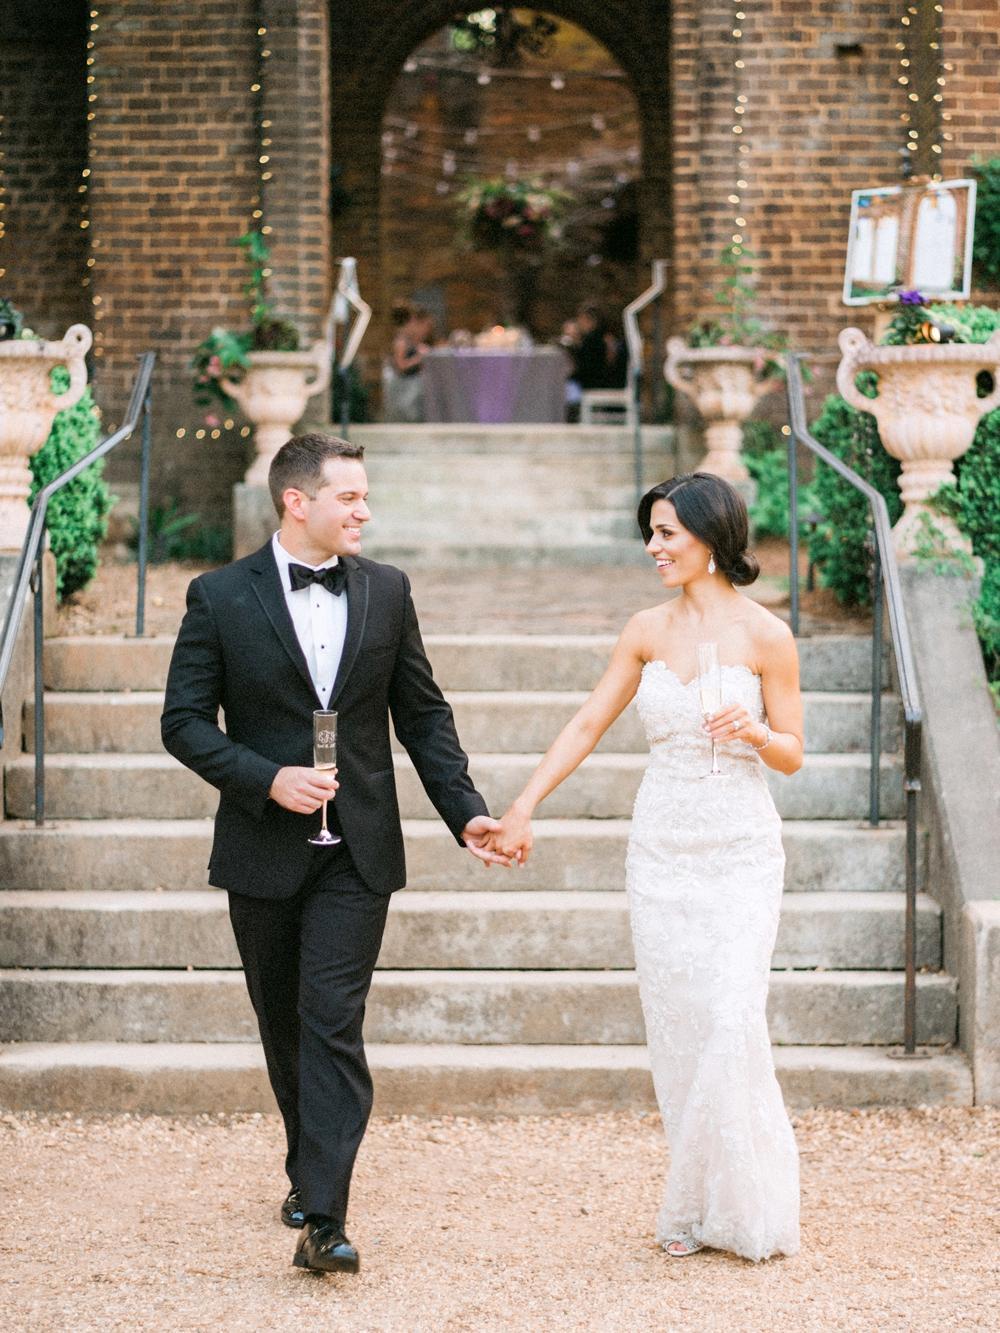 Barnsley Planation Wedding. Georgia Wedding Photographer_0035.jpg